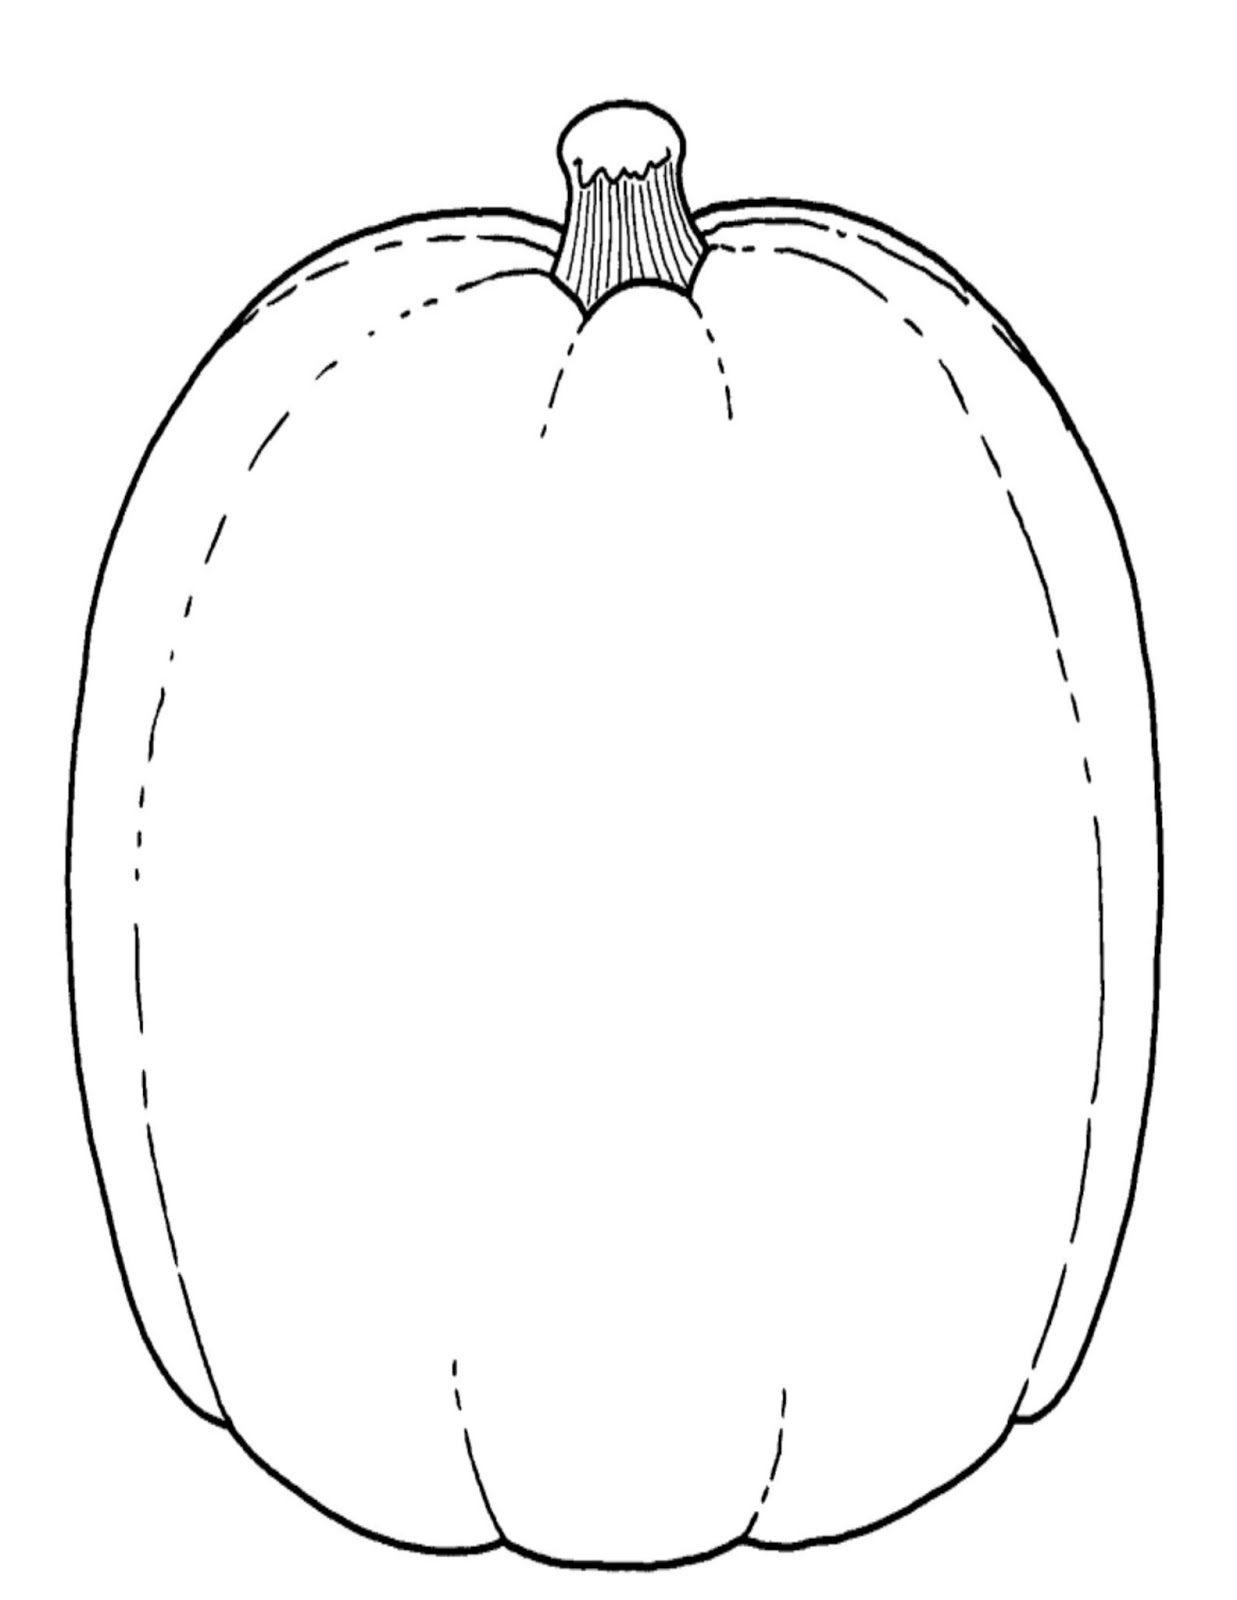 Pumpkin Shape Template | Cyberuse - Pumpkin Shape Template Printable Free